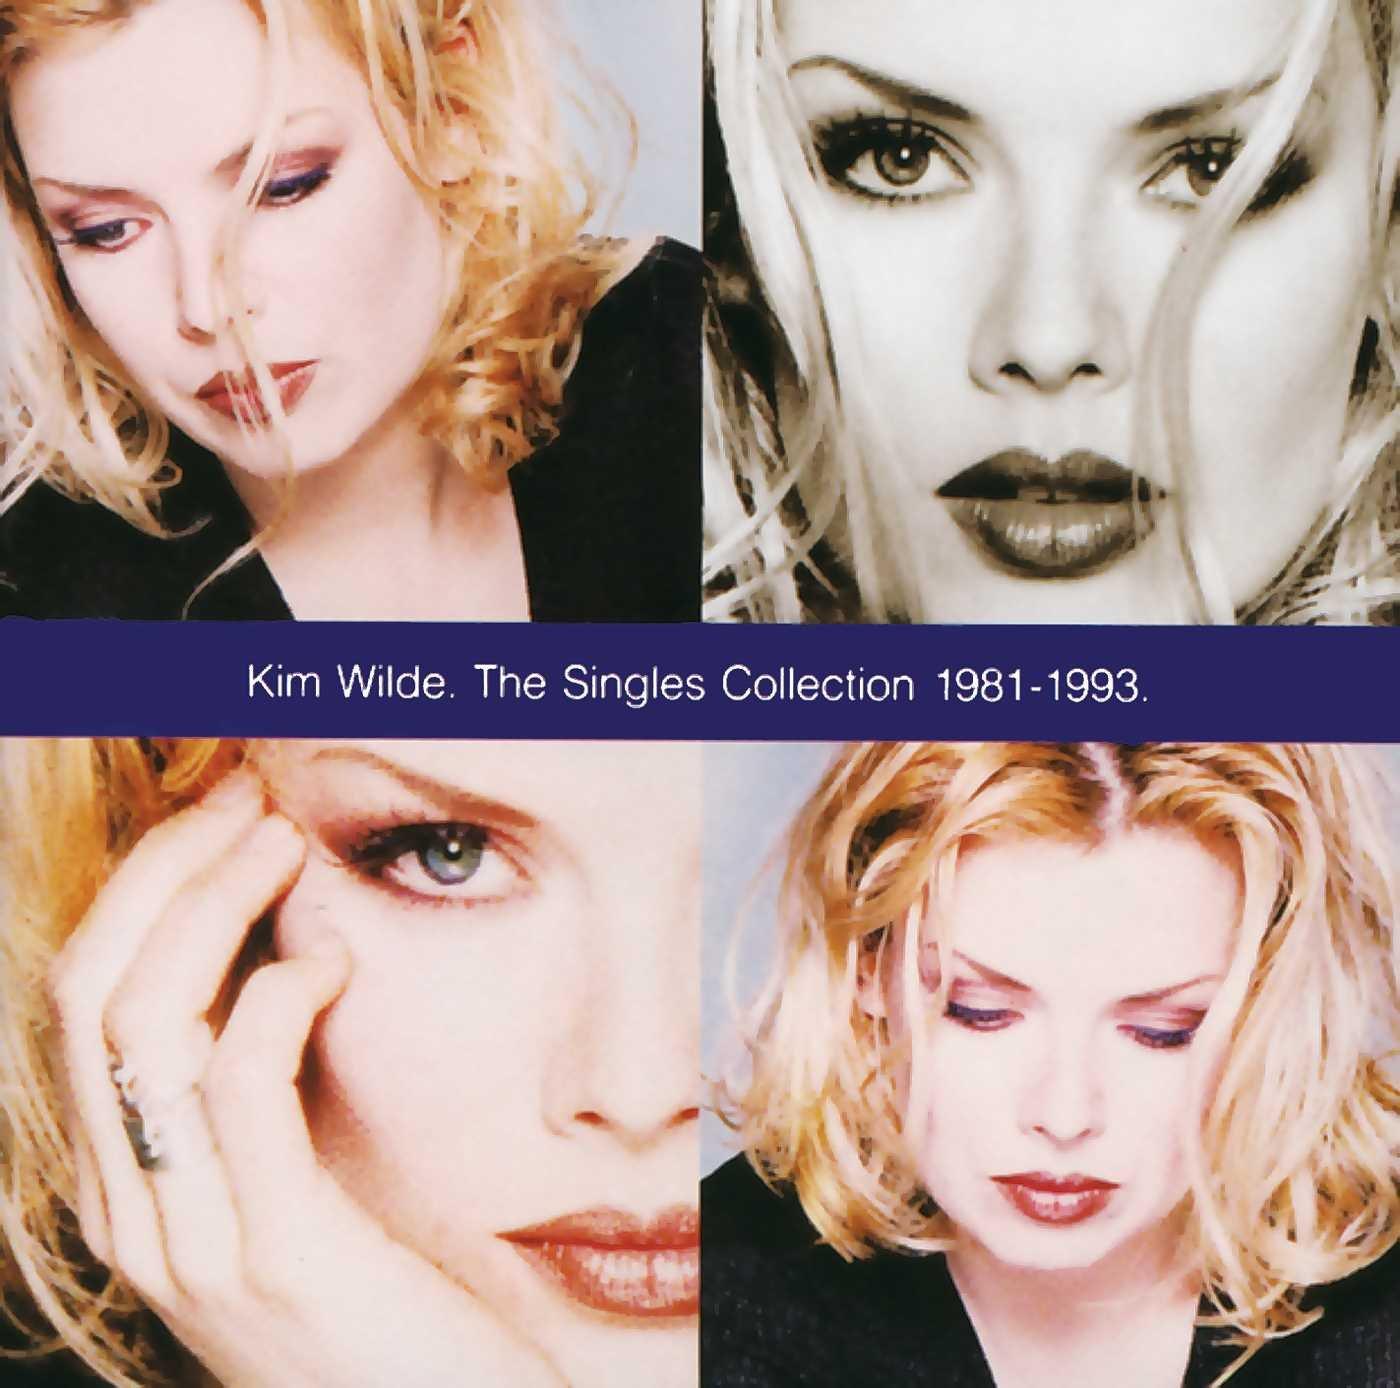 Kim Wilde - Kim Wilde: The Singles Collection (1981-1993)